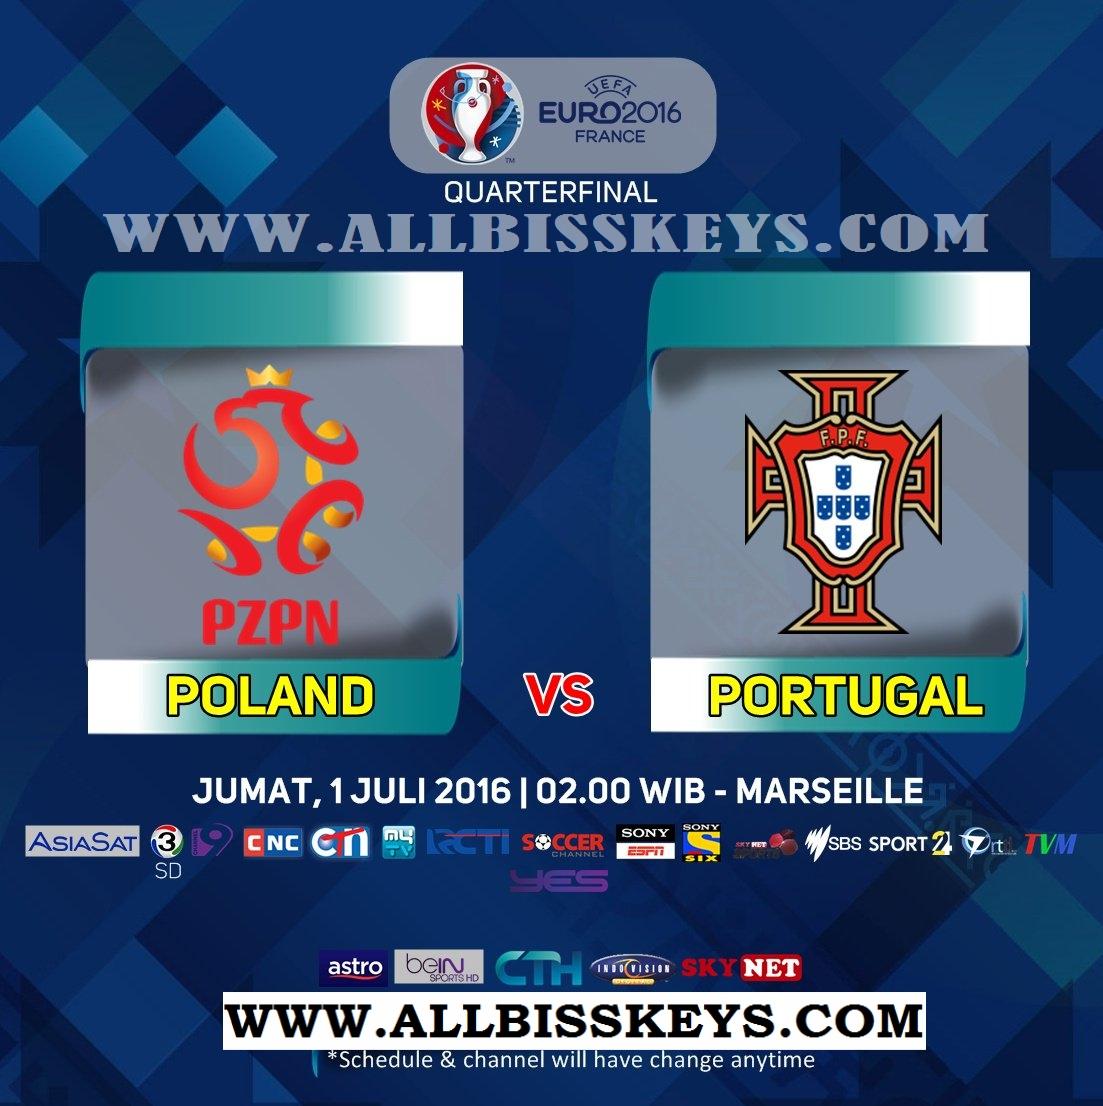 UEFA Euro 2016 | Quarter-Final Poland vs Portugal European